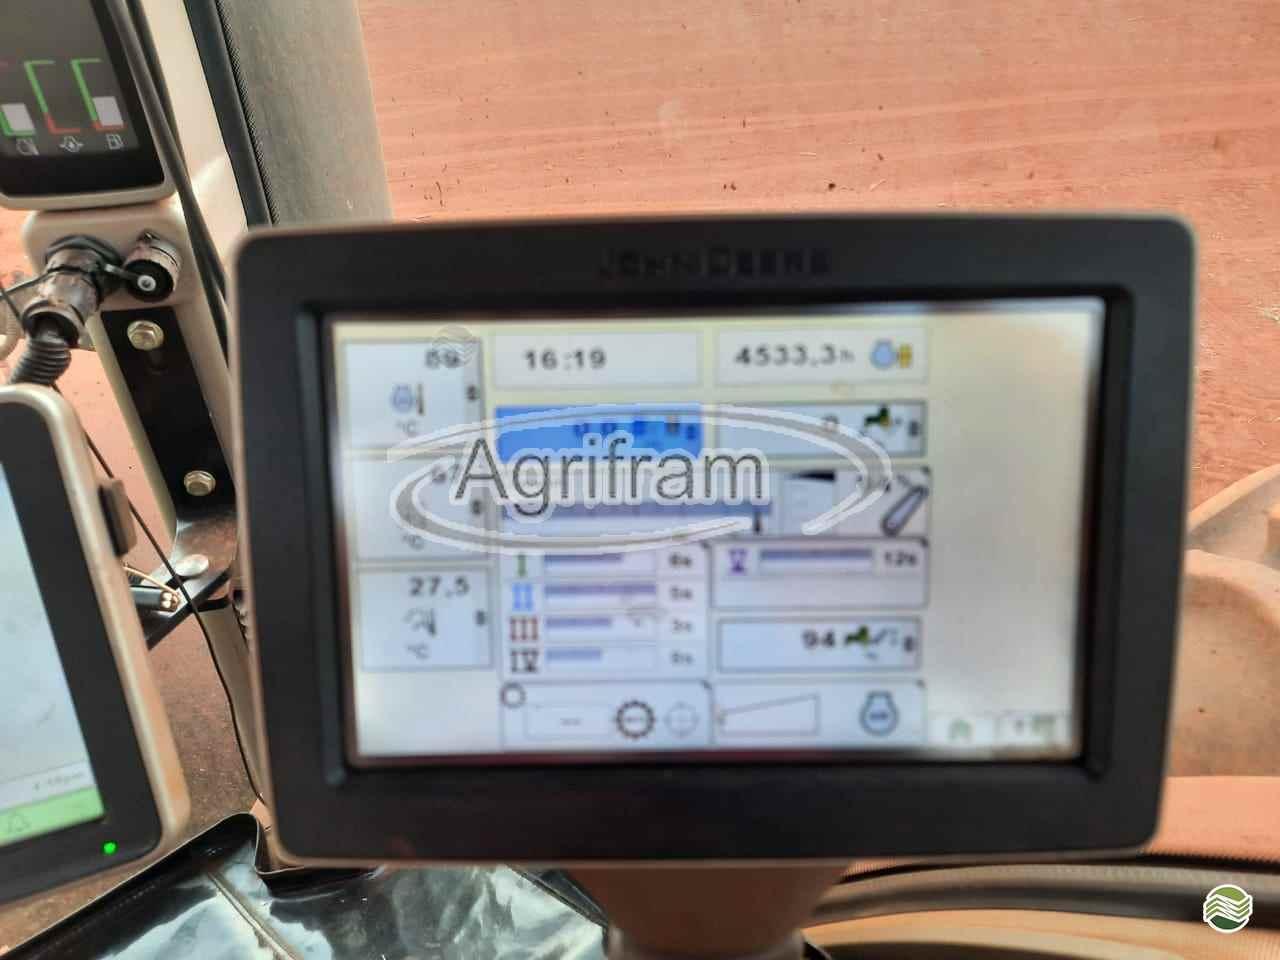 JOHN DEERE JOHN DEERE 8335  2013/2013 Agrifram Máquinas e Soluções Agrícolas